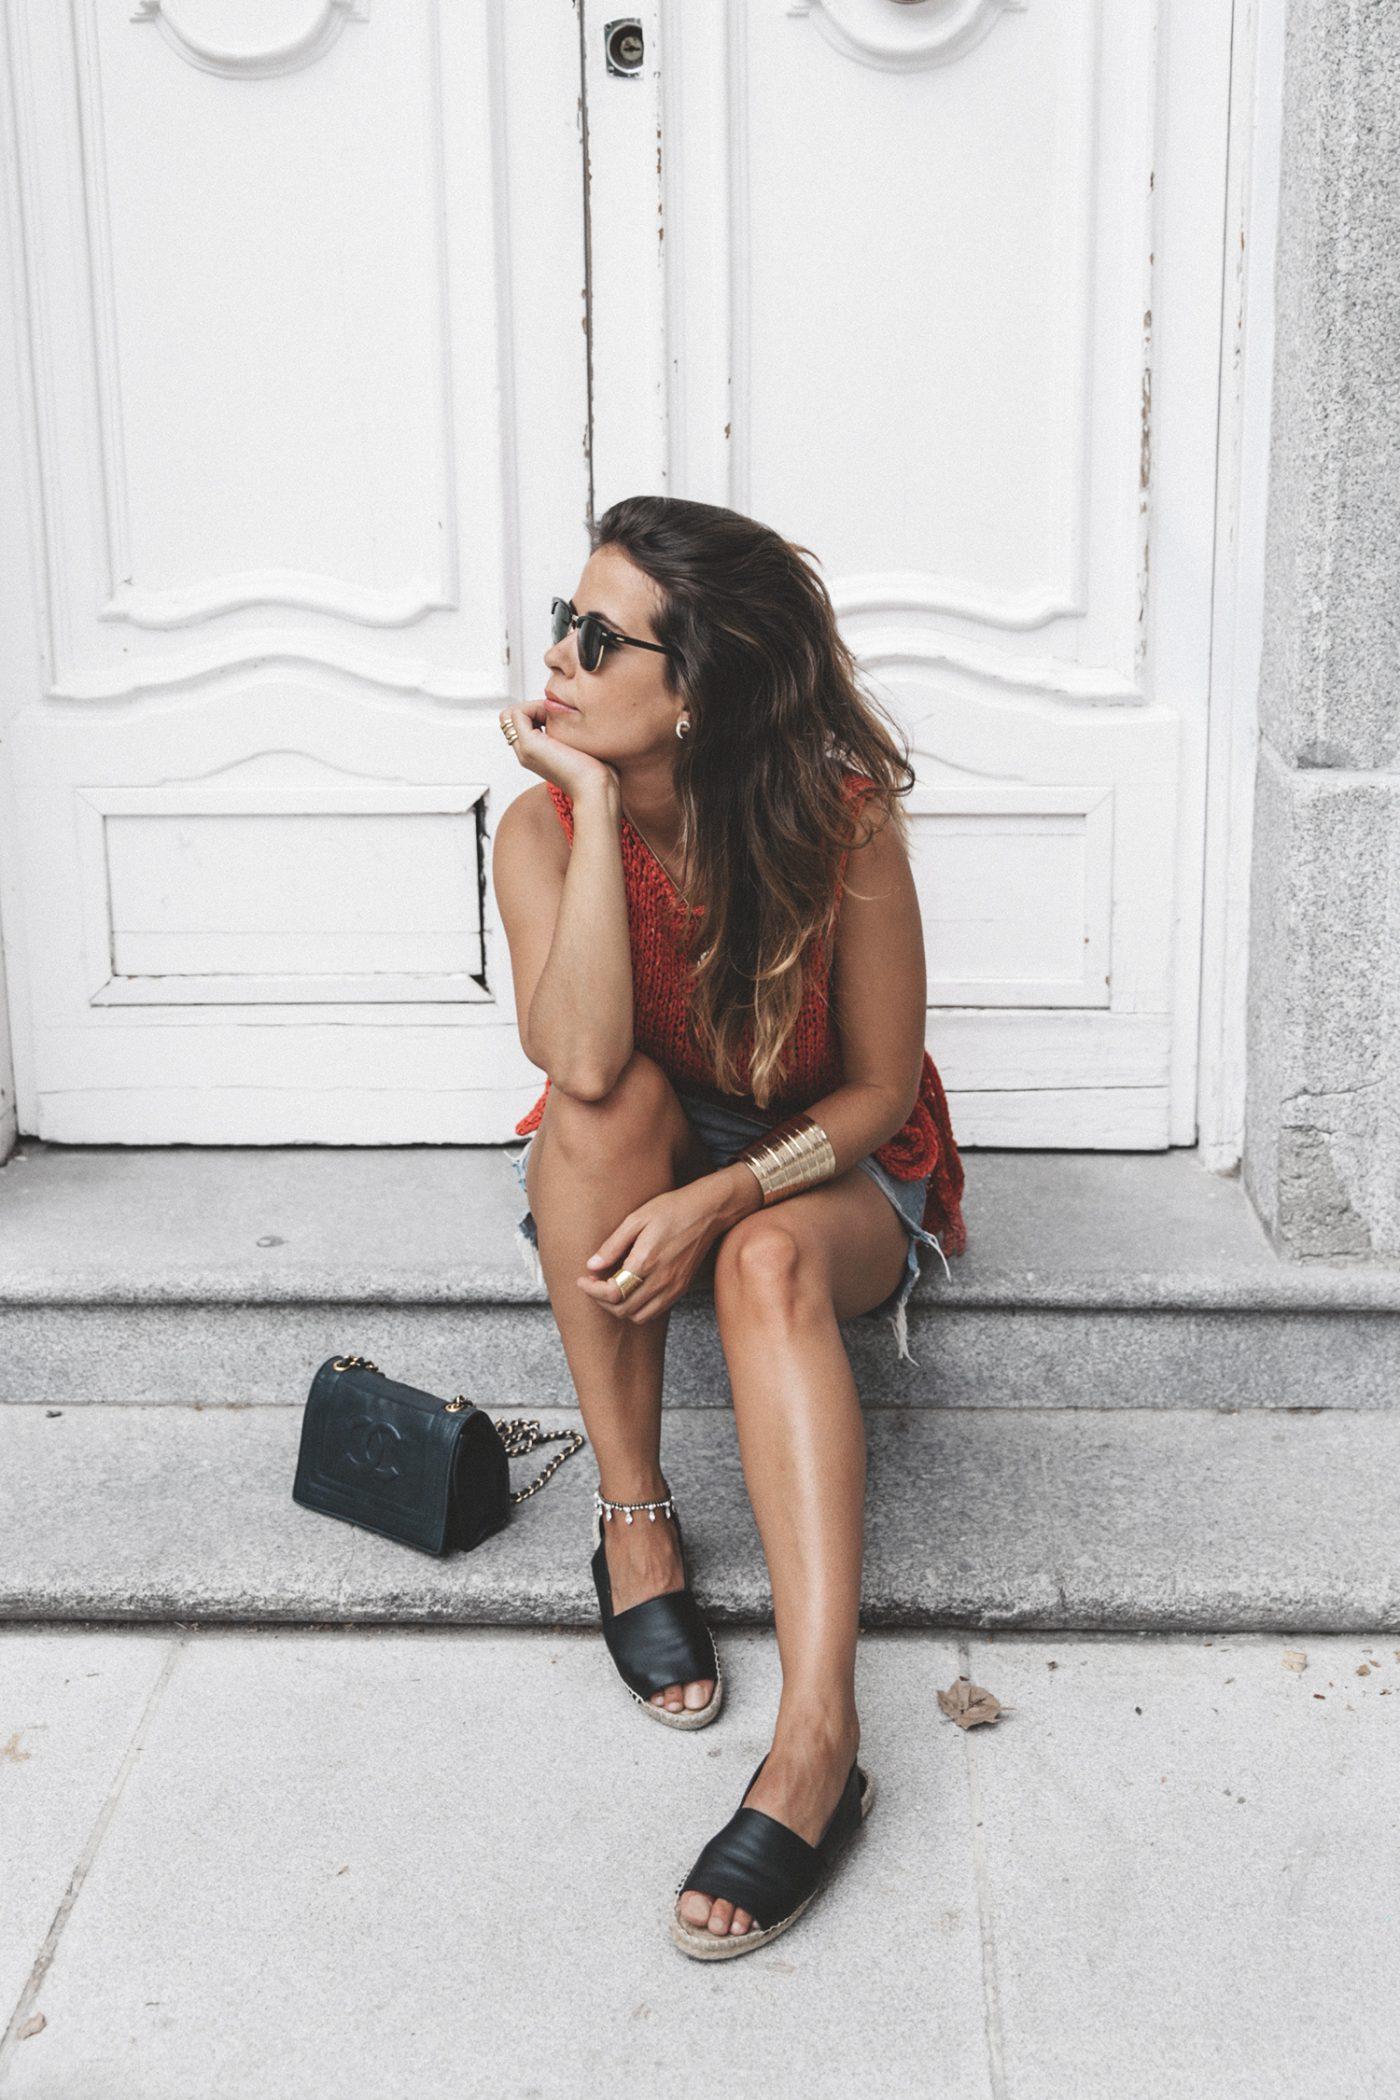 Summery_knit-Levis_Vintage_Skirt-Zalando_Espadrilles-Black_Sandals-Collage_Vintage_Horn_Necklace-Outfit-Street_Style-44